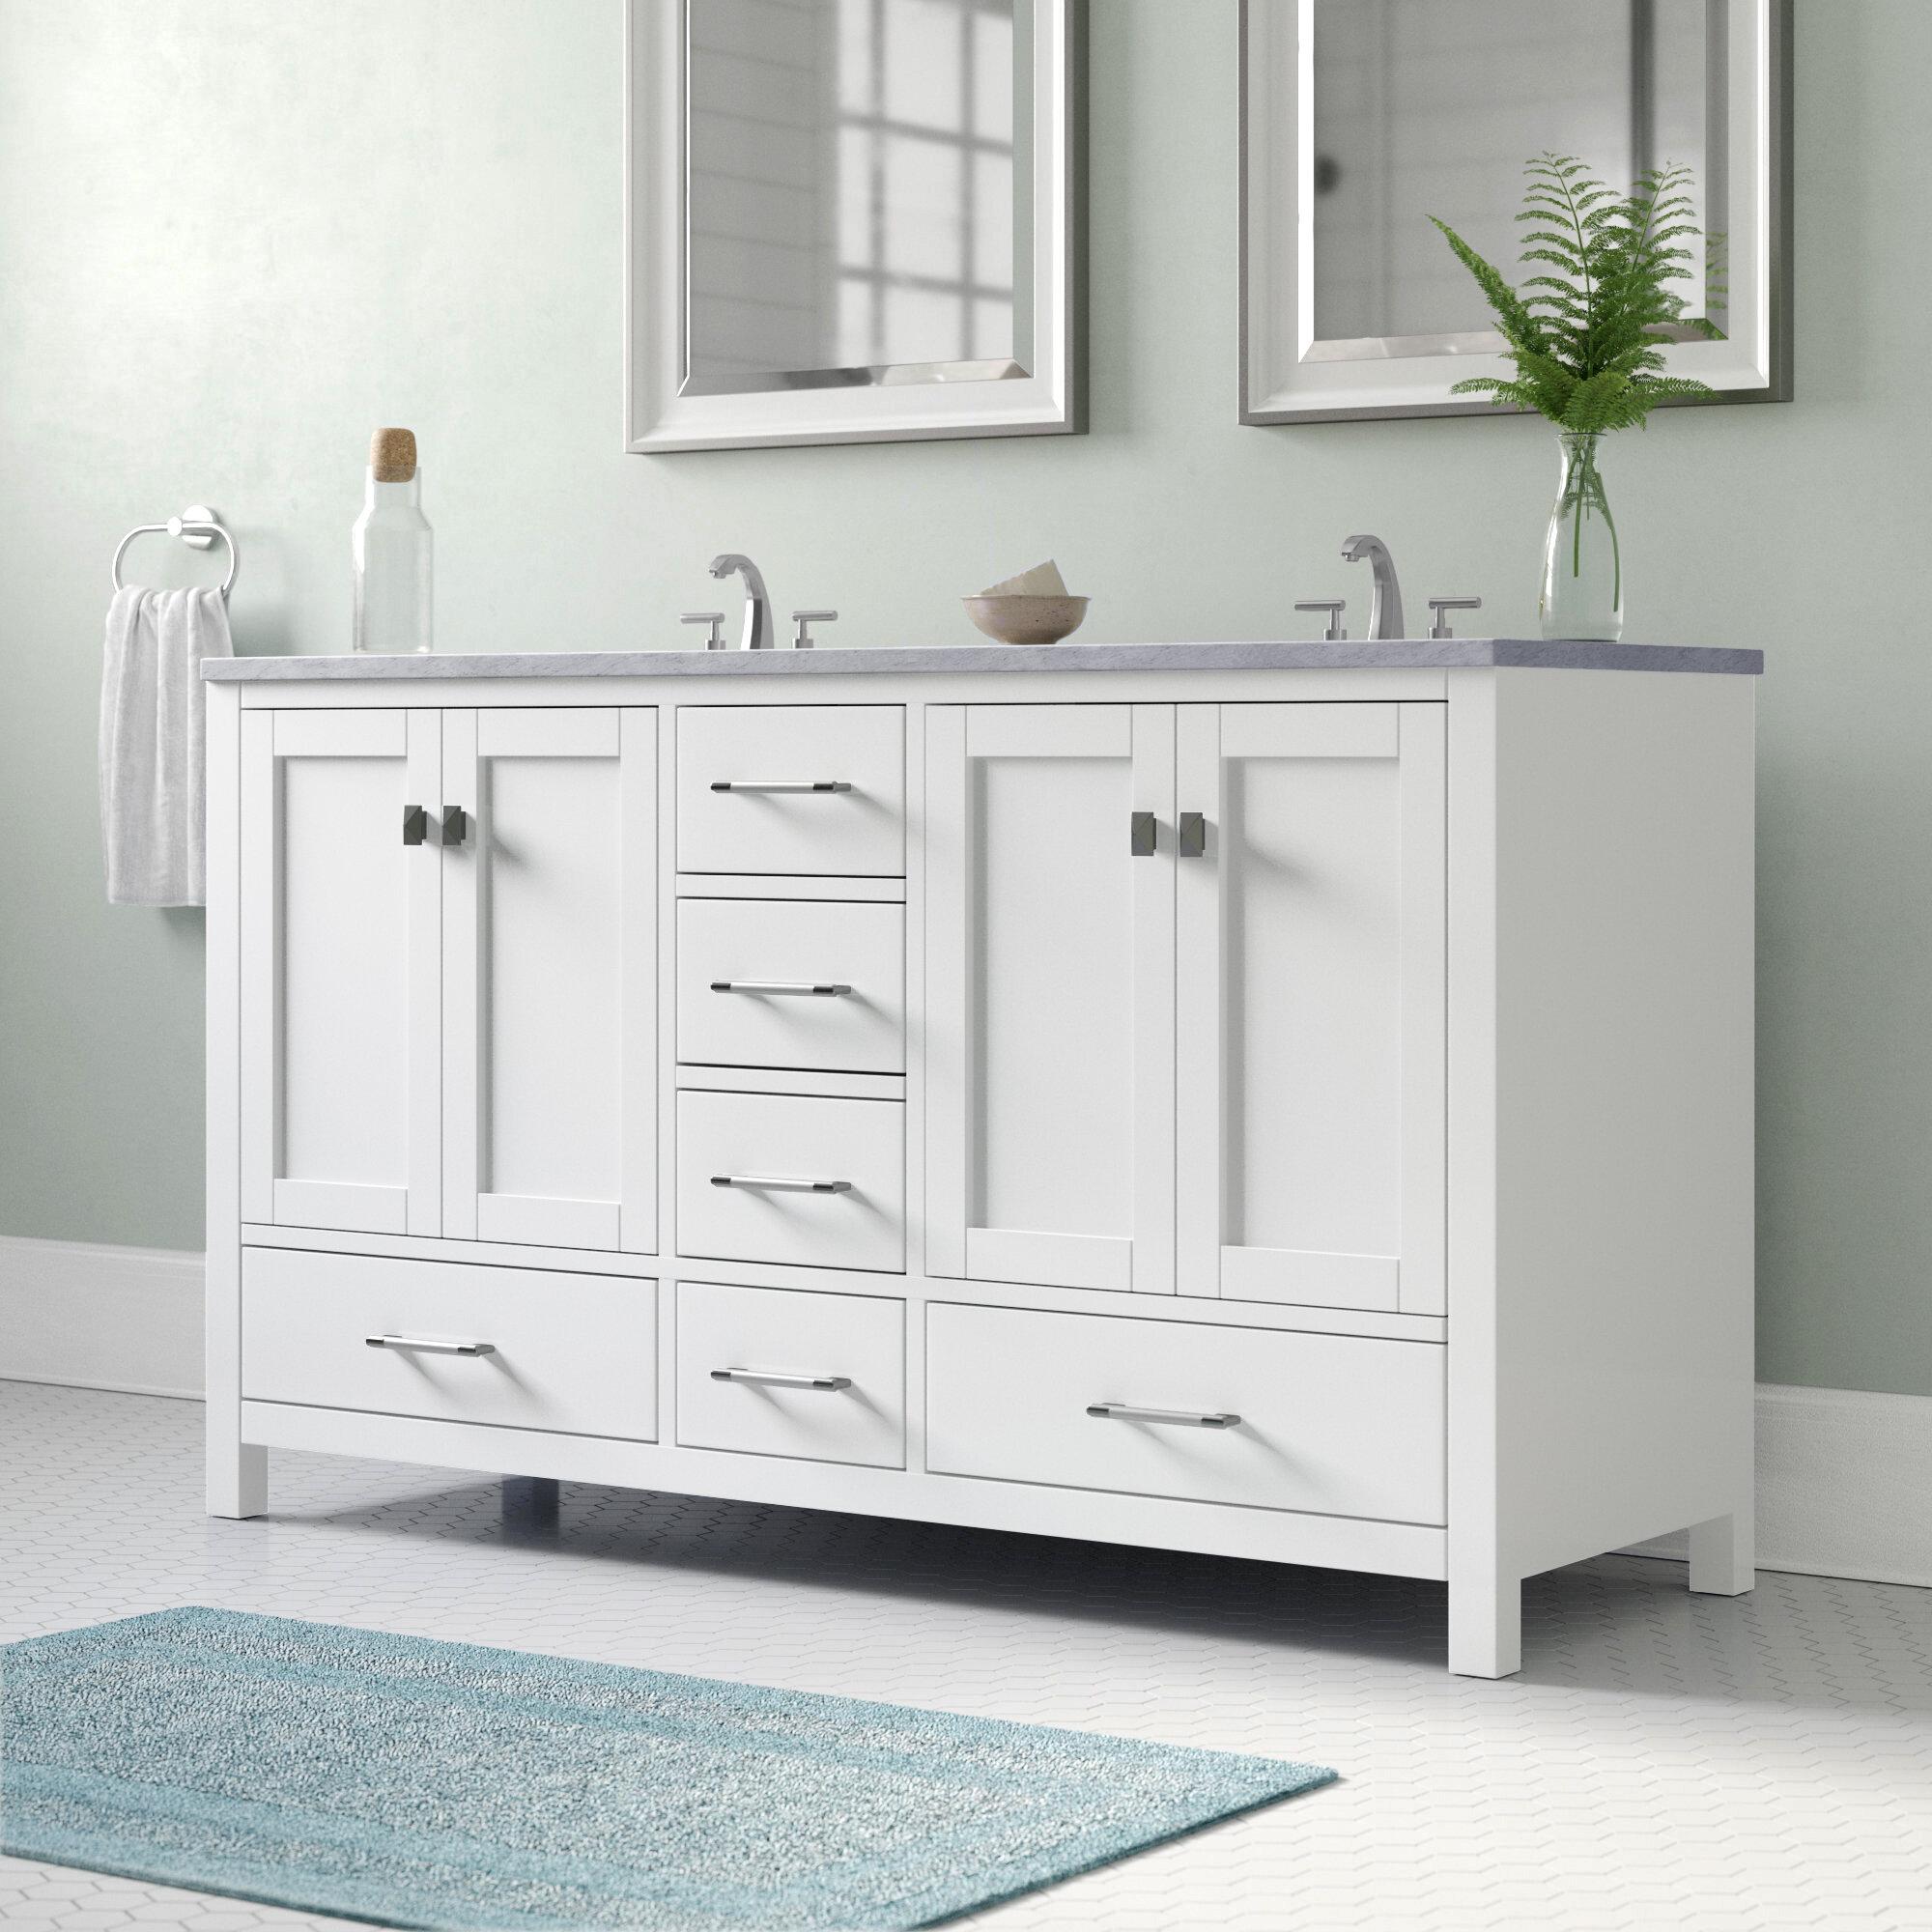 latitude run kazanovicz 60 bathroom vanity base only reviews rh wayfair com bathroom vanity 600mm bathroom vanity 60 single sink